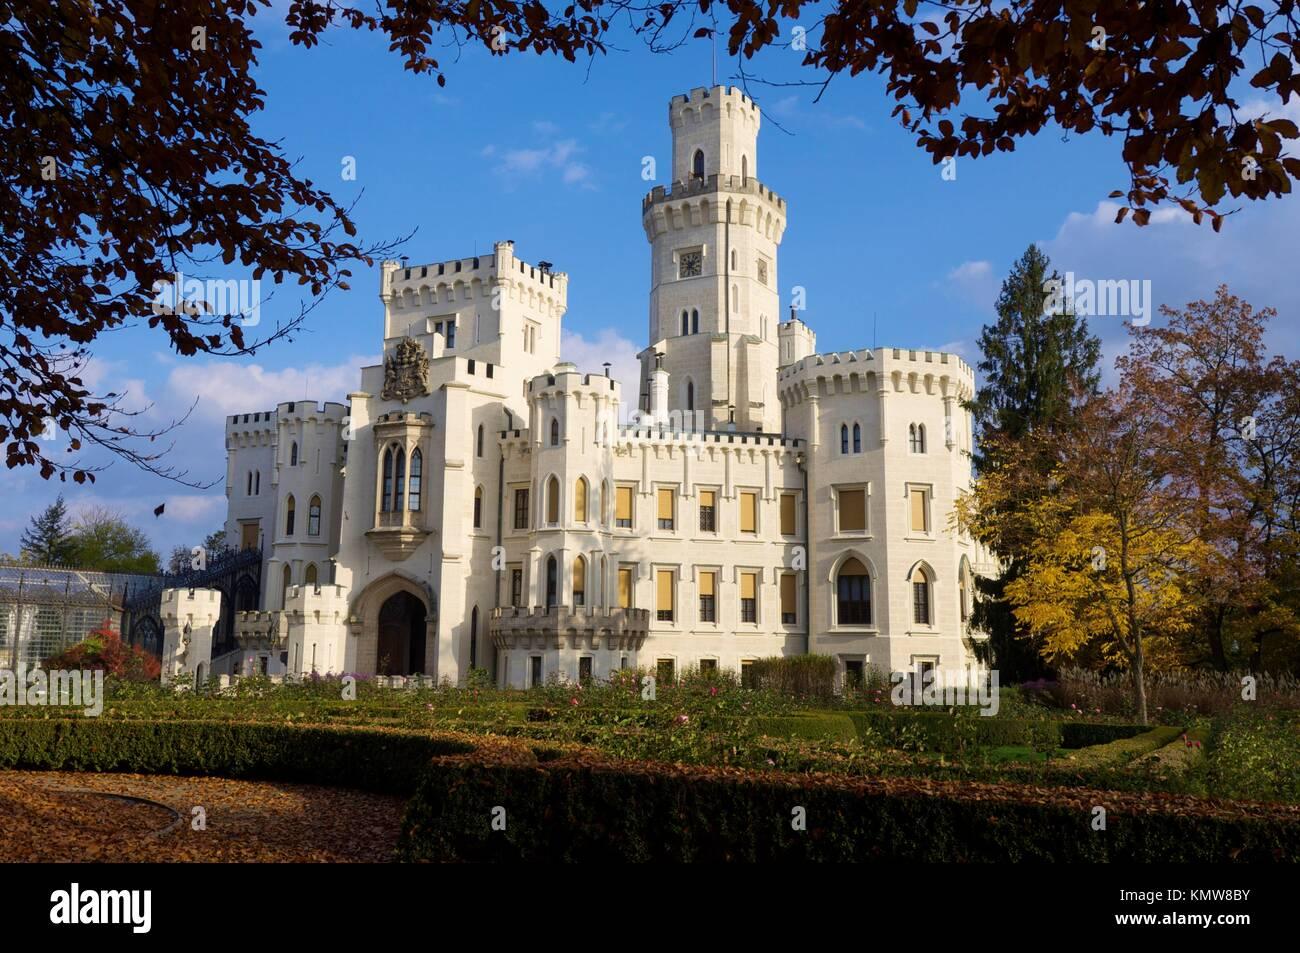 castle neogothic Hluboka nad Vltavou, Czech Republic - Stock Image